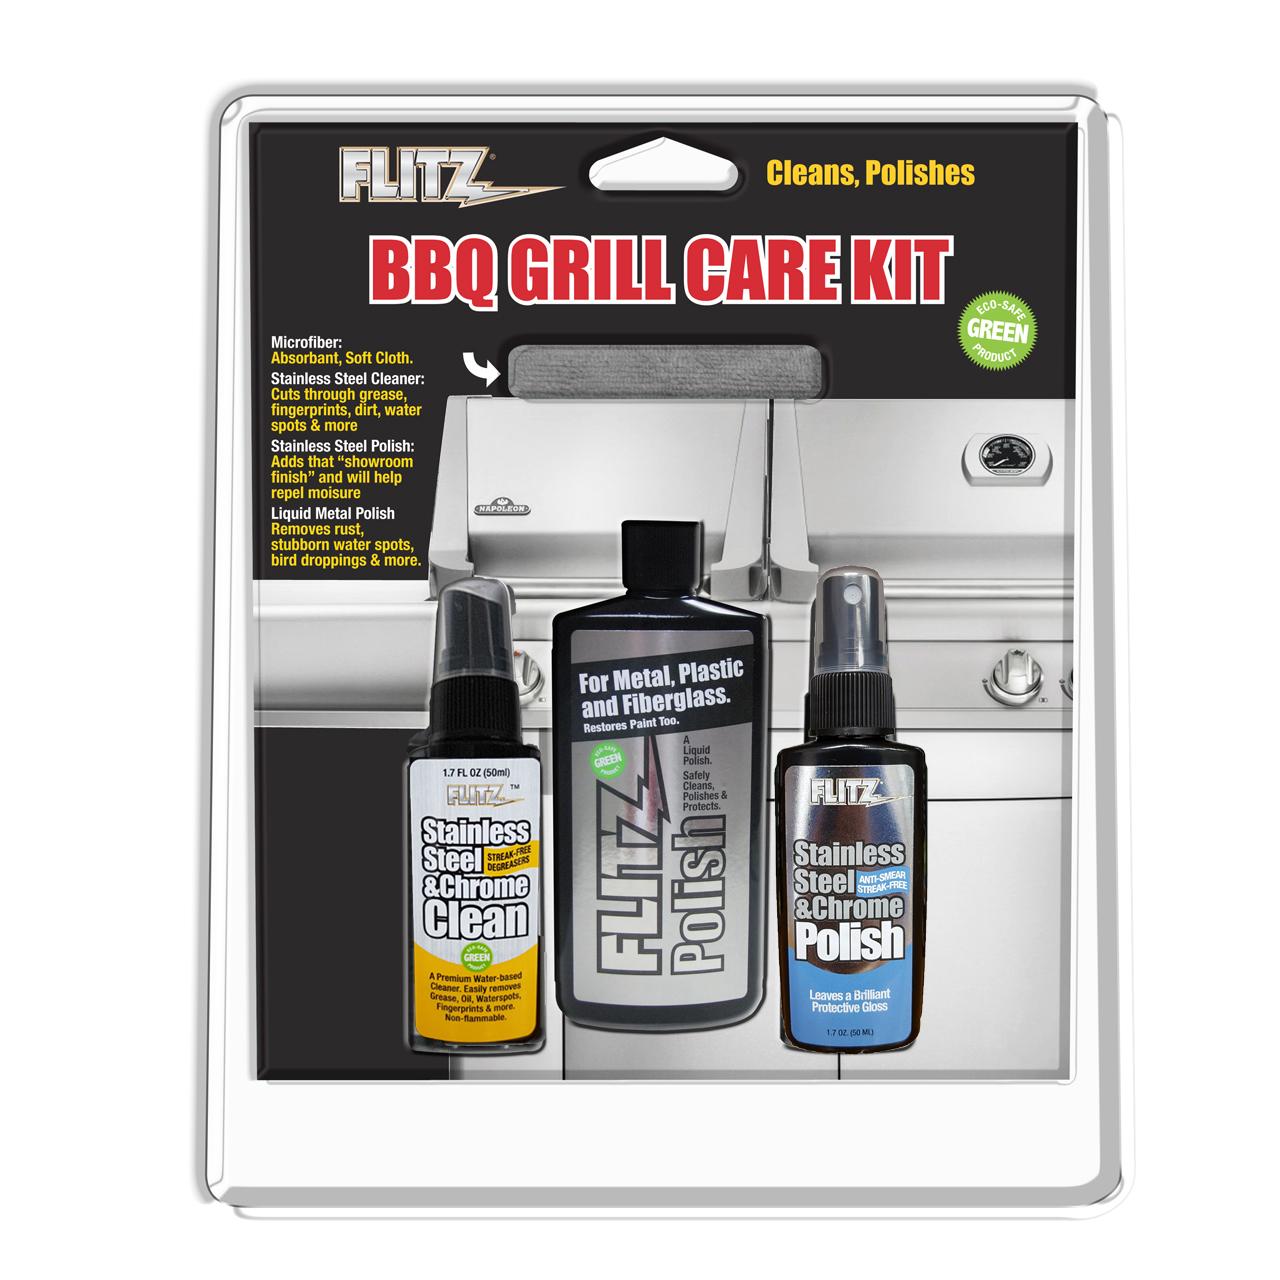 BBQ Grill Care Kit